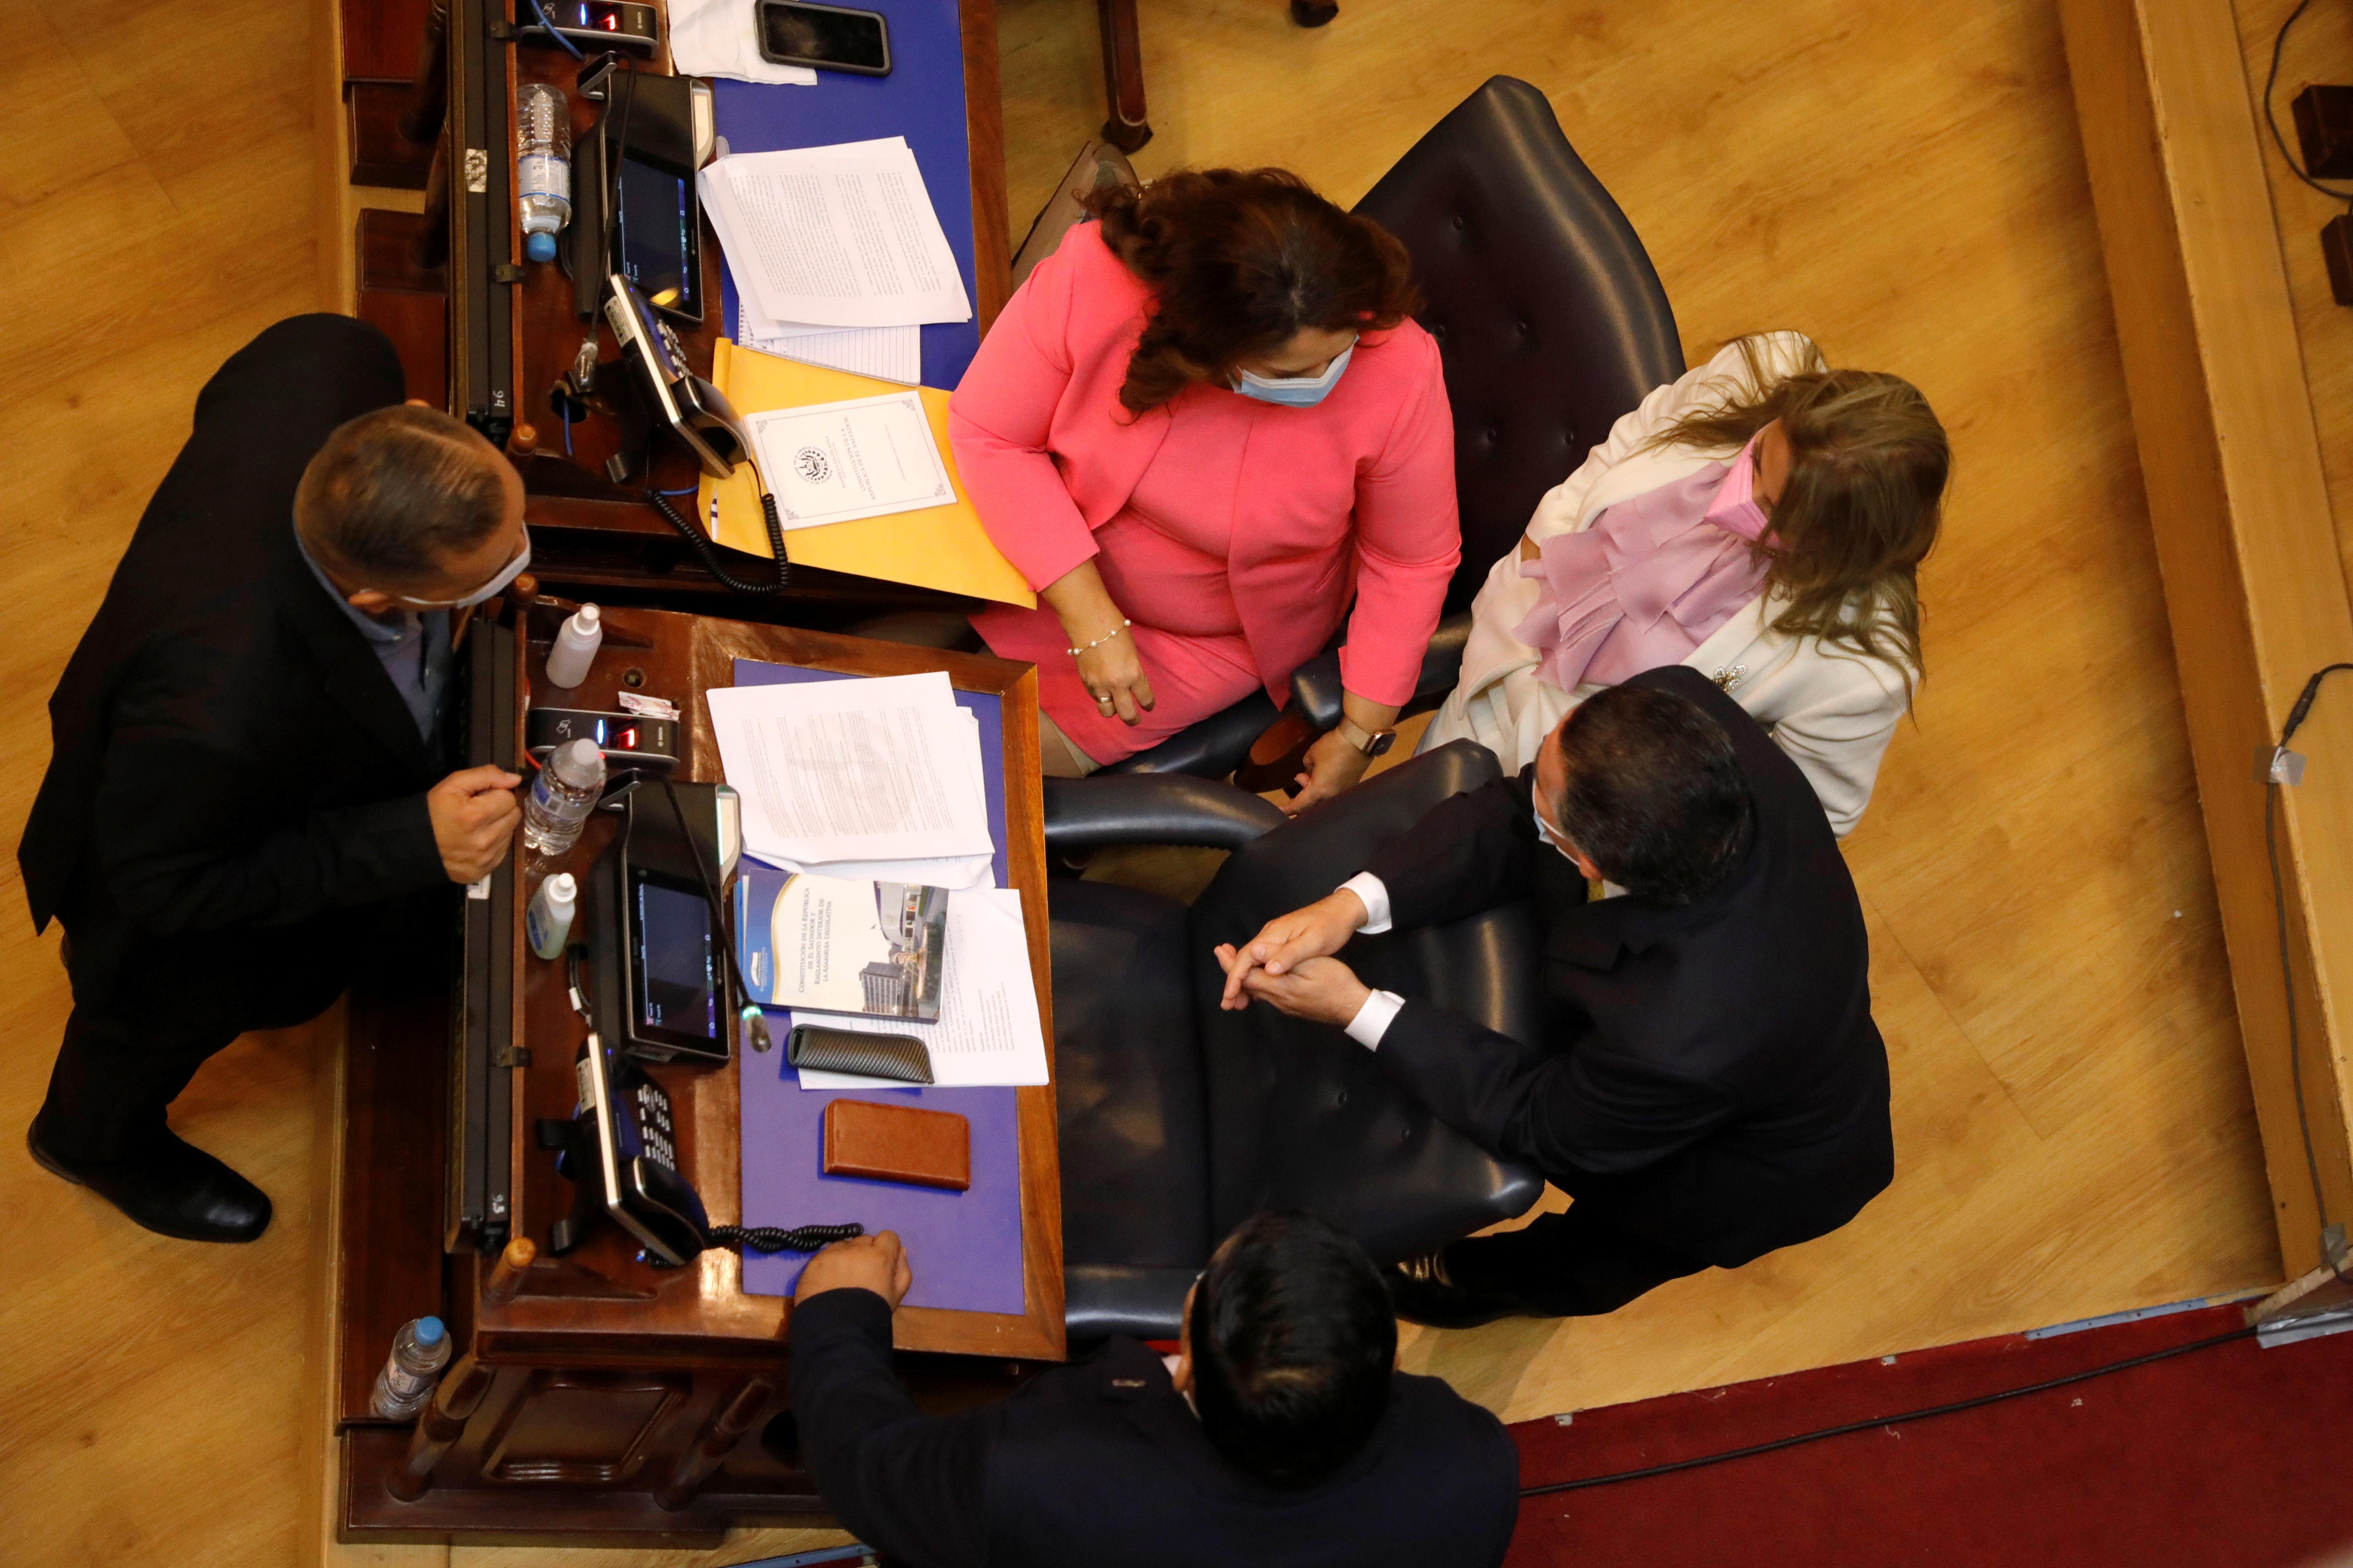 Oposition representatives participate in a session to discuss the removal of Supreme Court judges at the salvadoran congress, in San Salvador, El Salvador, May 1, 2021. REUTERS/Jose Cabezas